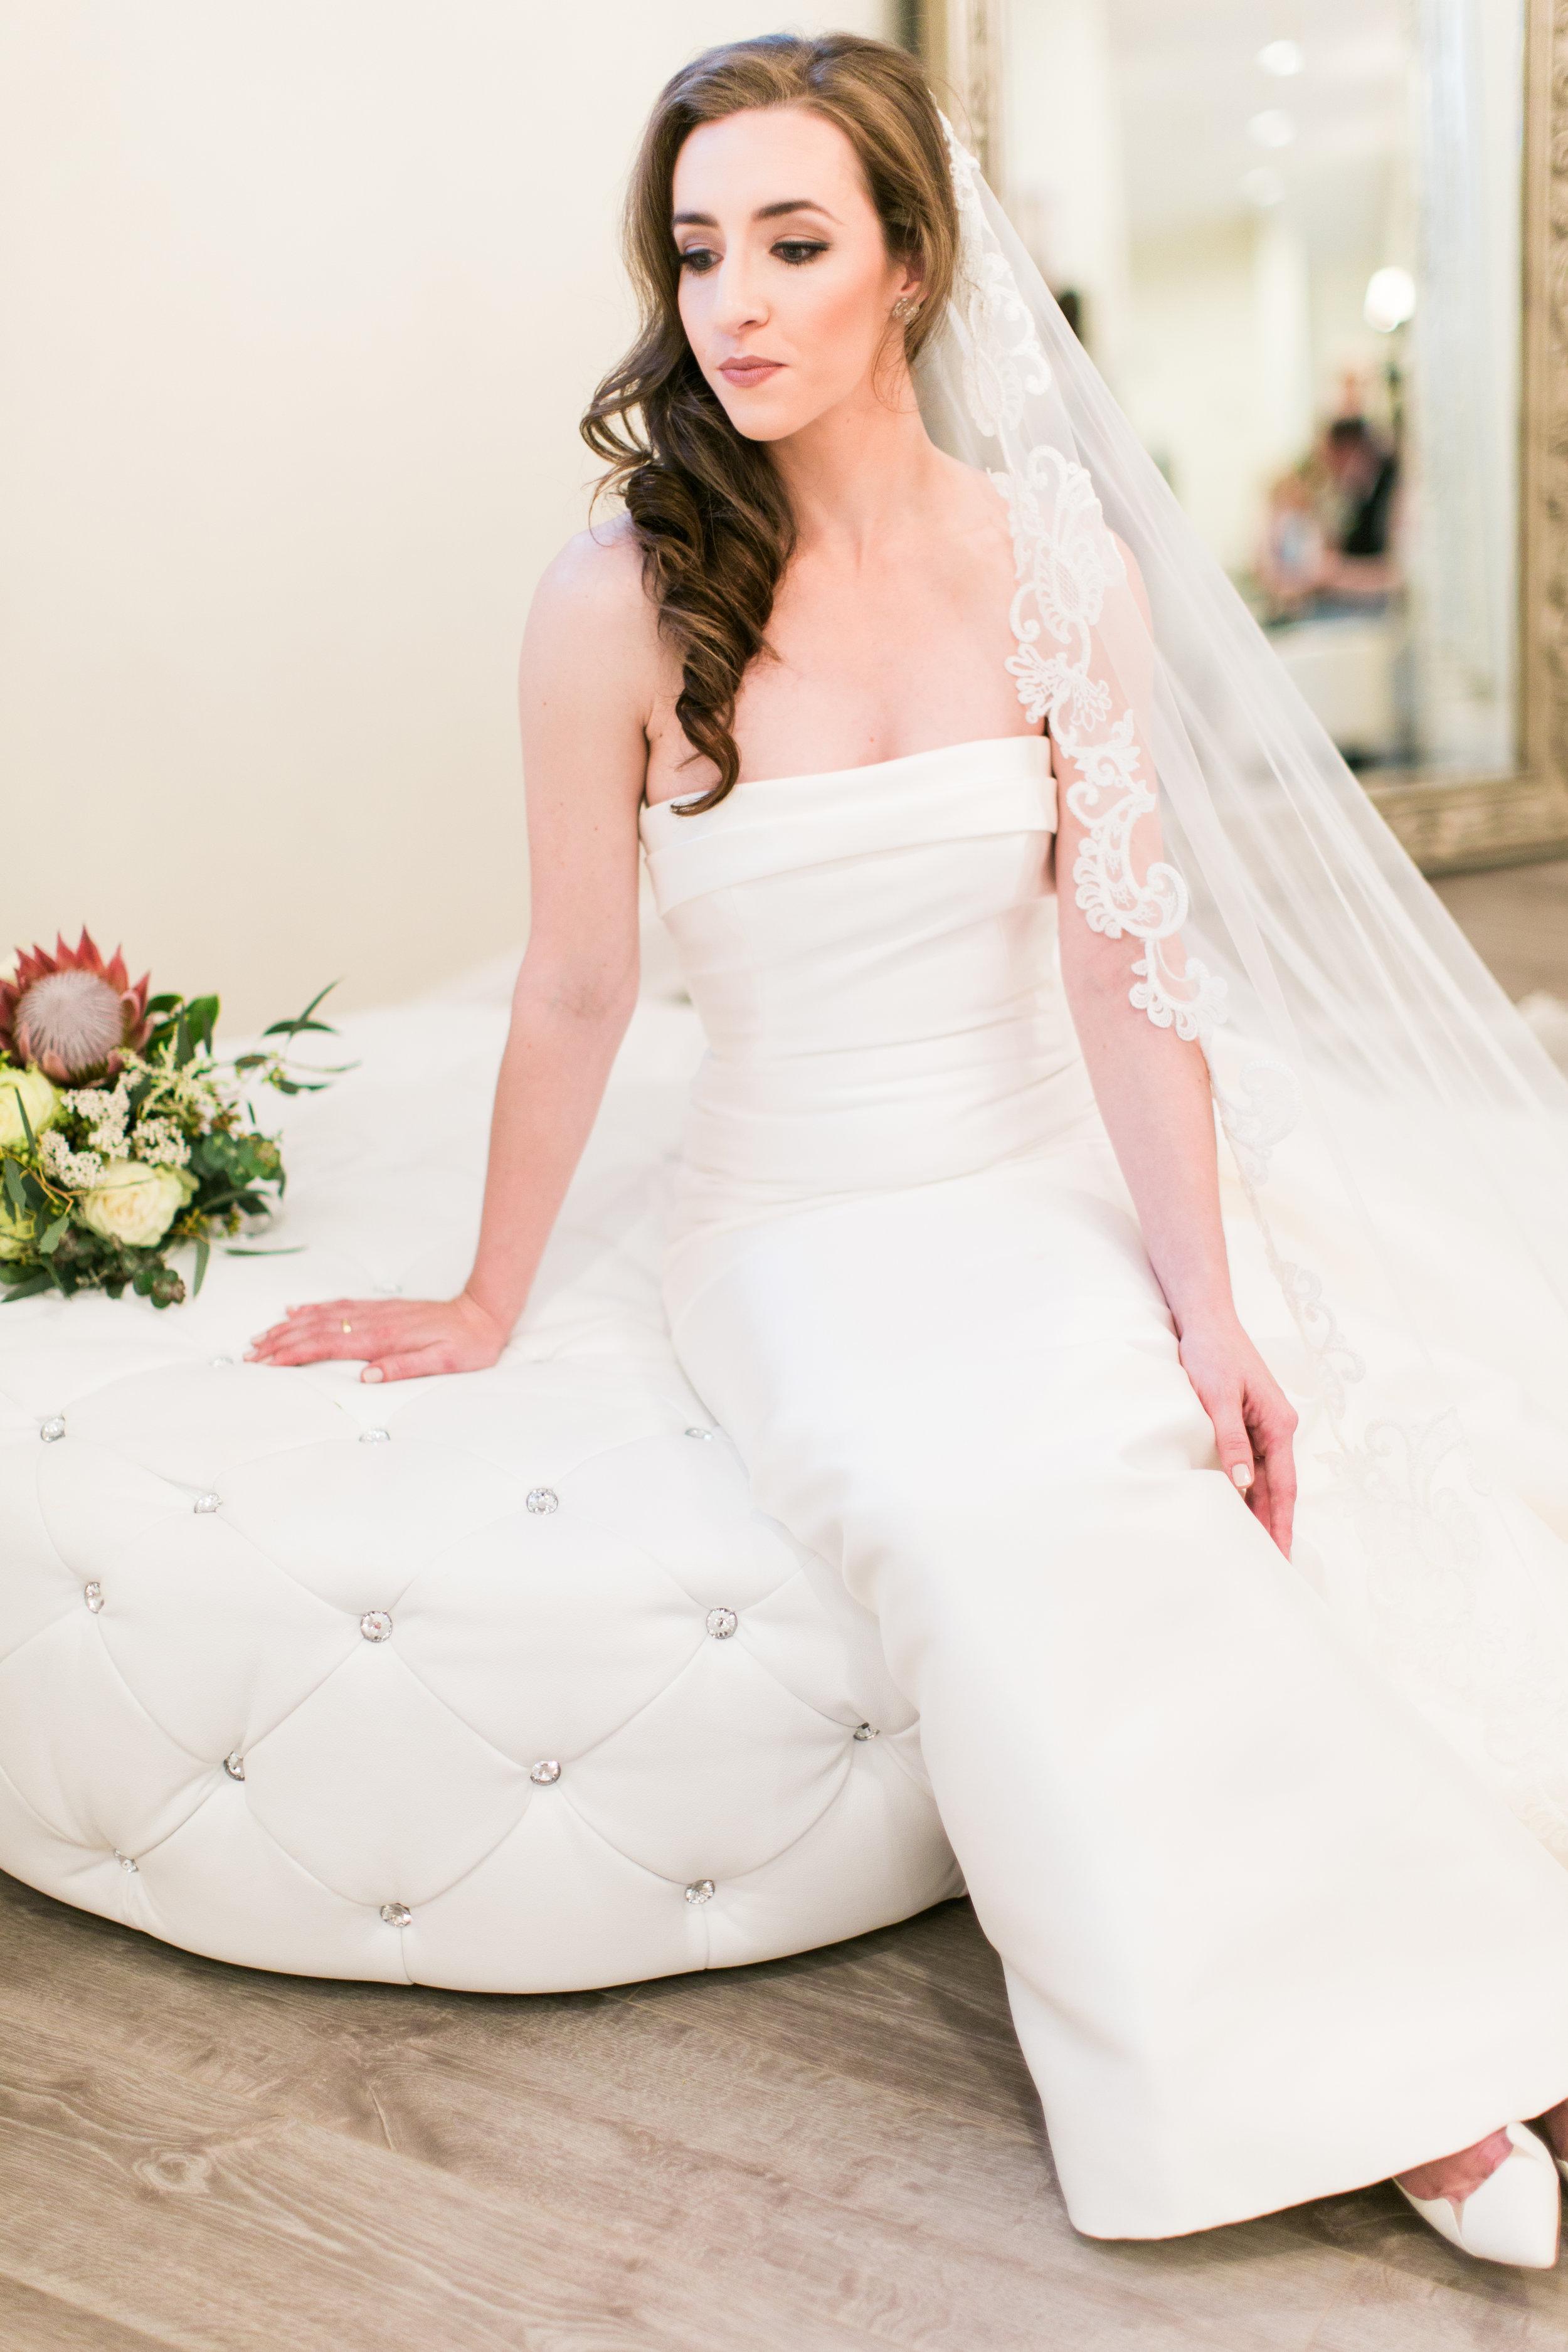 WeddingtonWedding0320.jpg